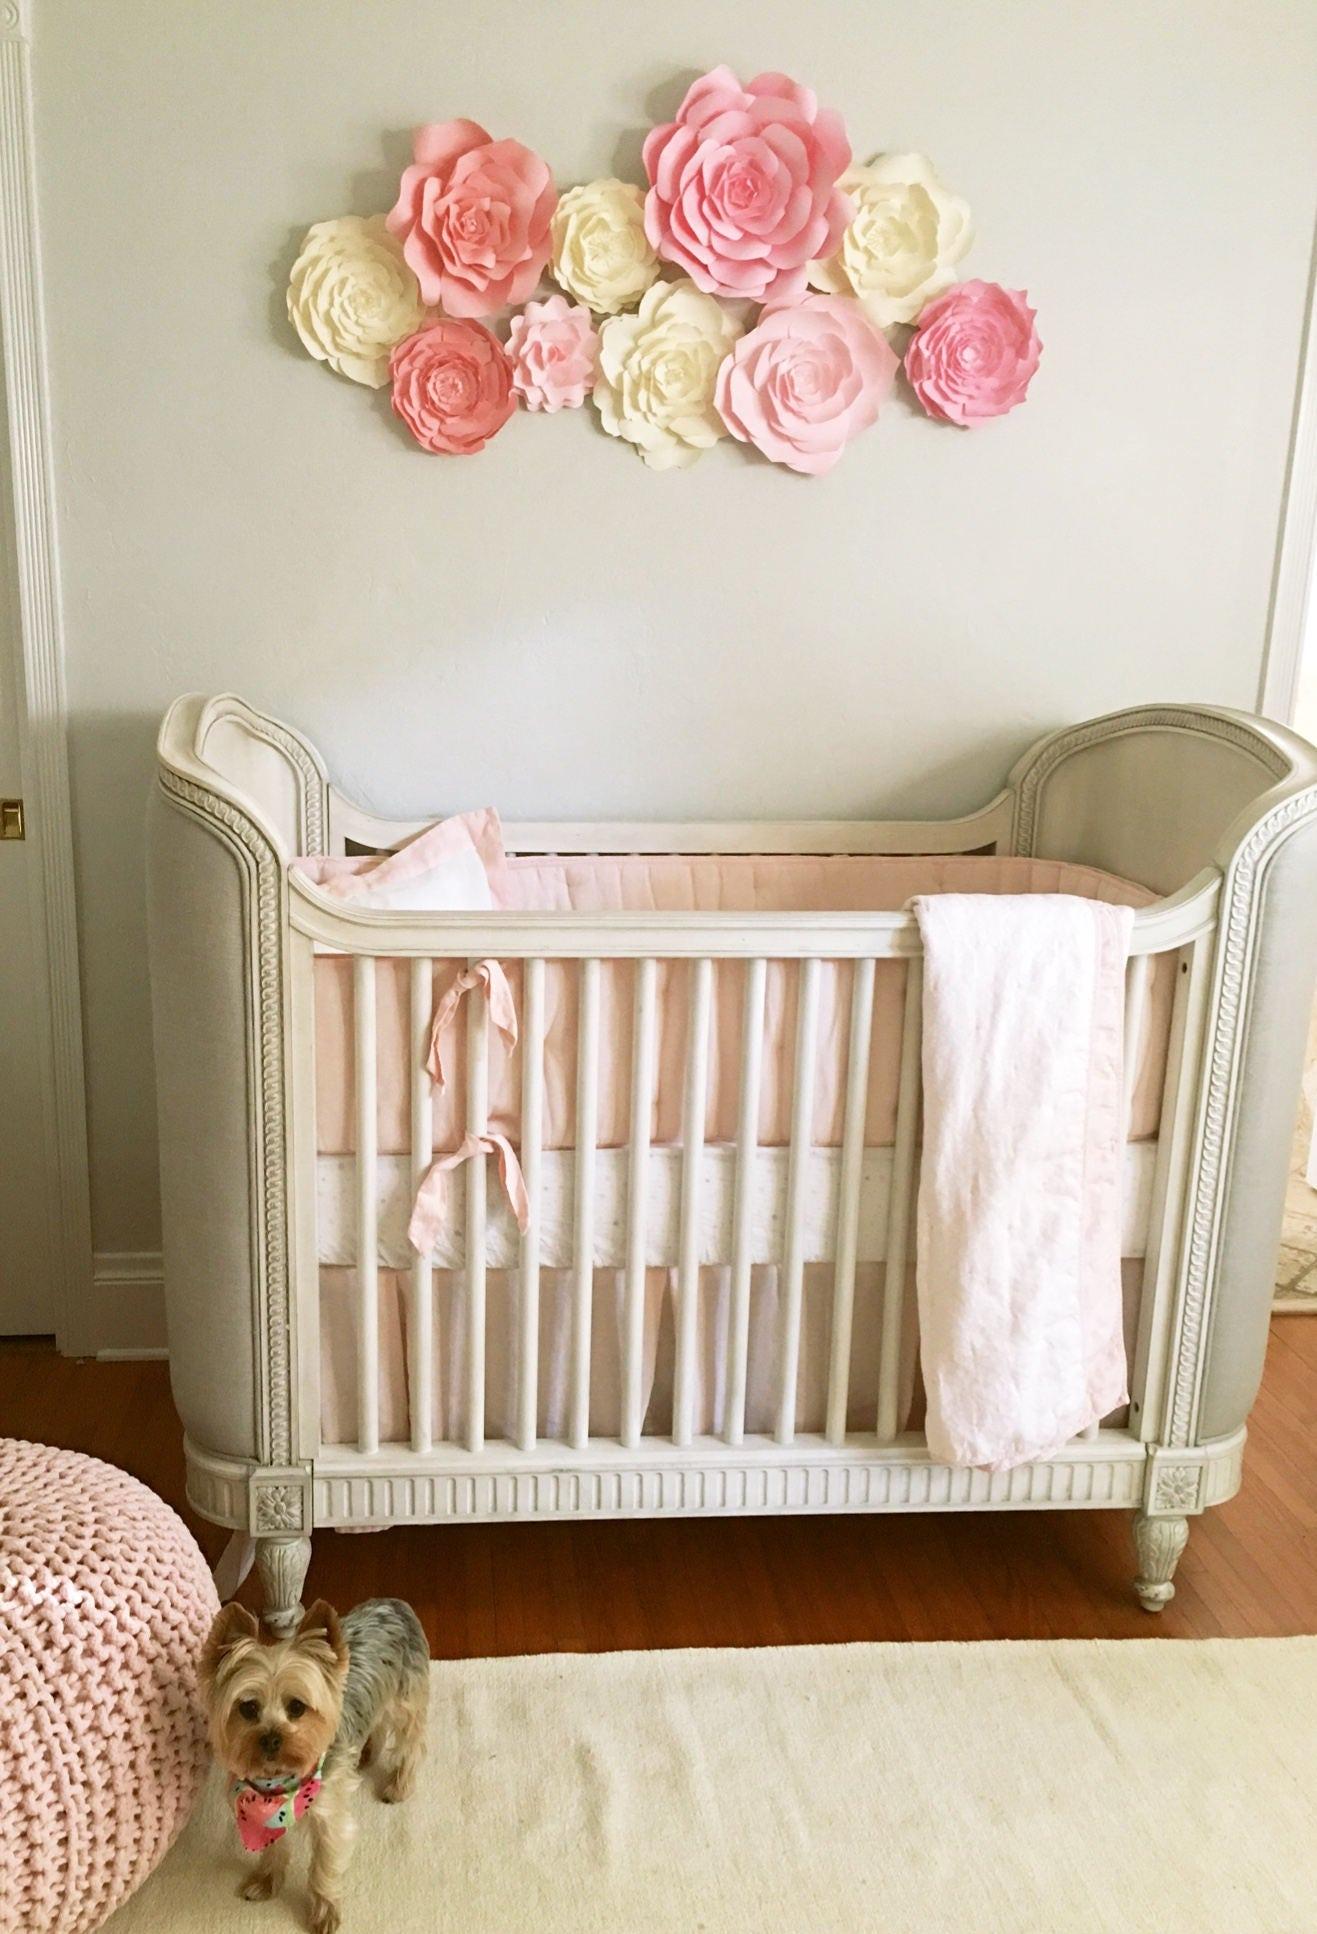 Curtains For Baby Girl Nursery: Baby Nursery Wall Decor Paper Flowers For Girls Nursery